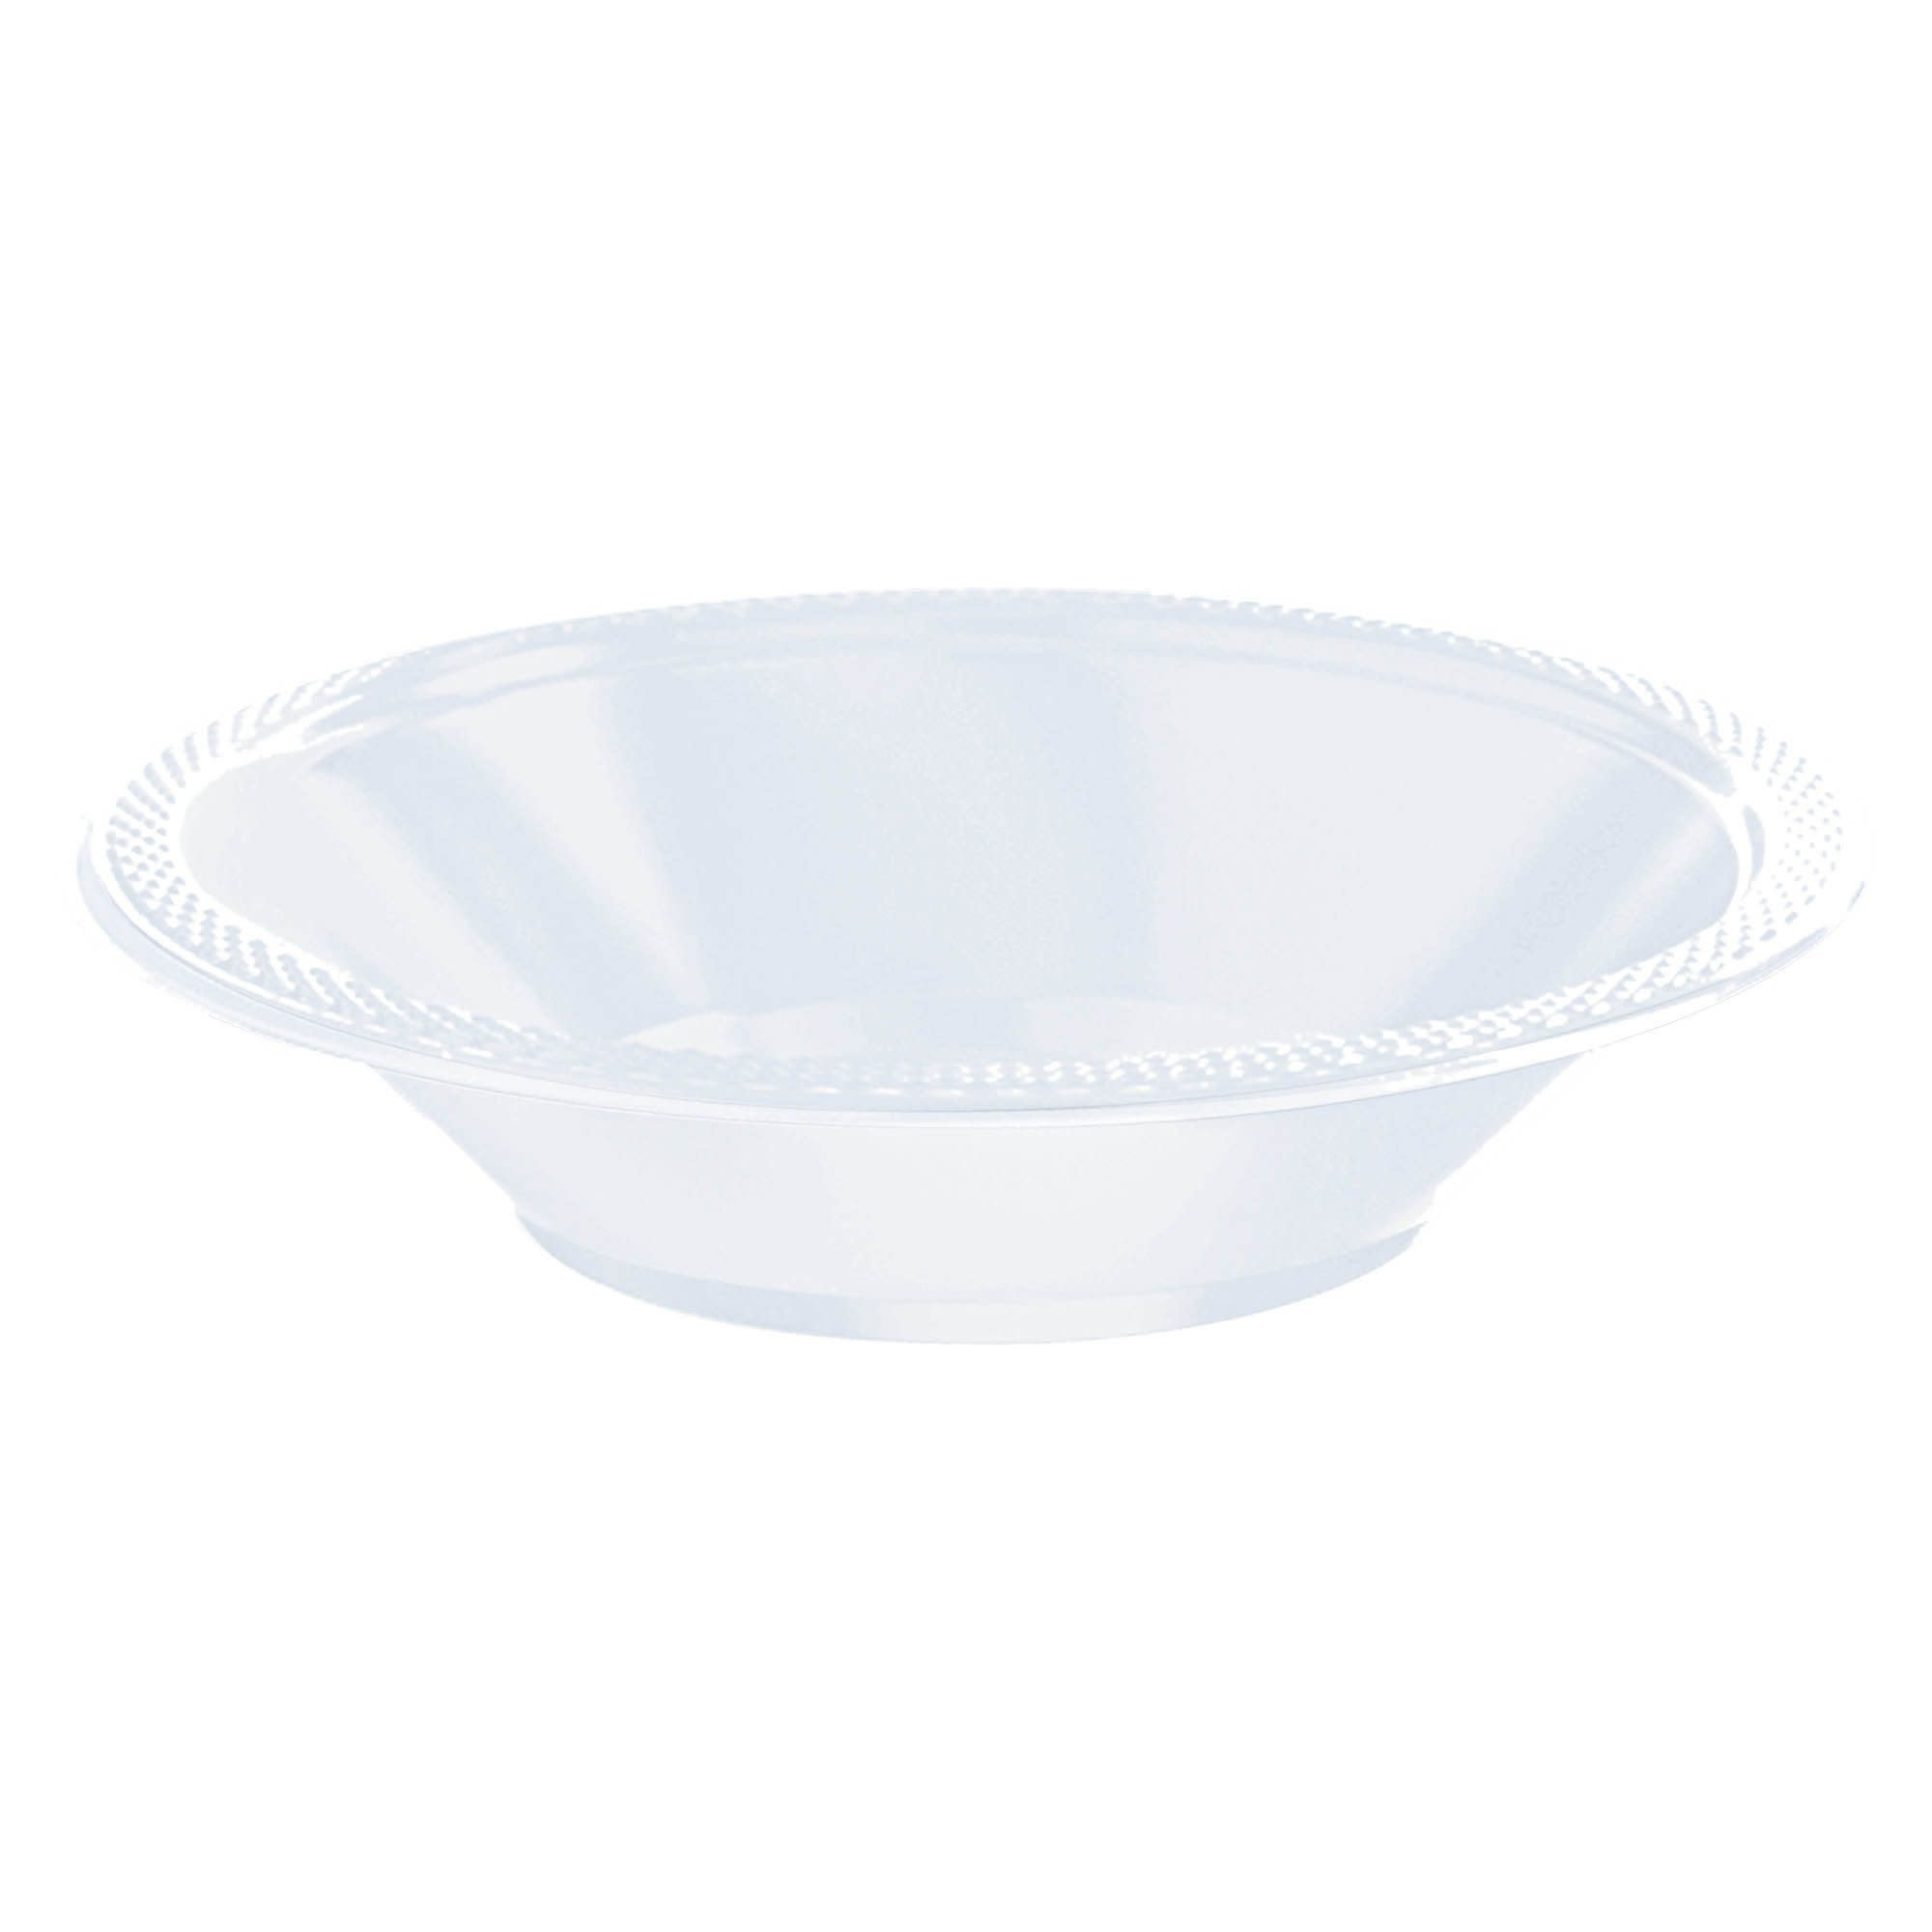 Clear Plastic Bowls, 12oz.